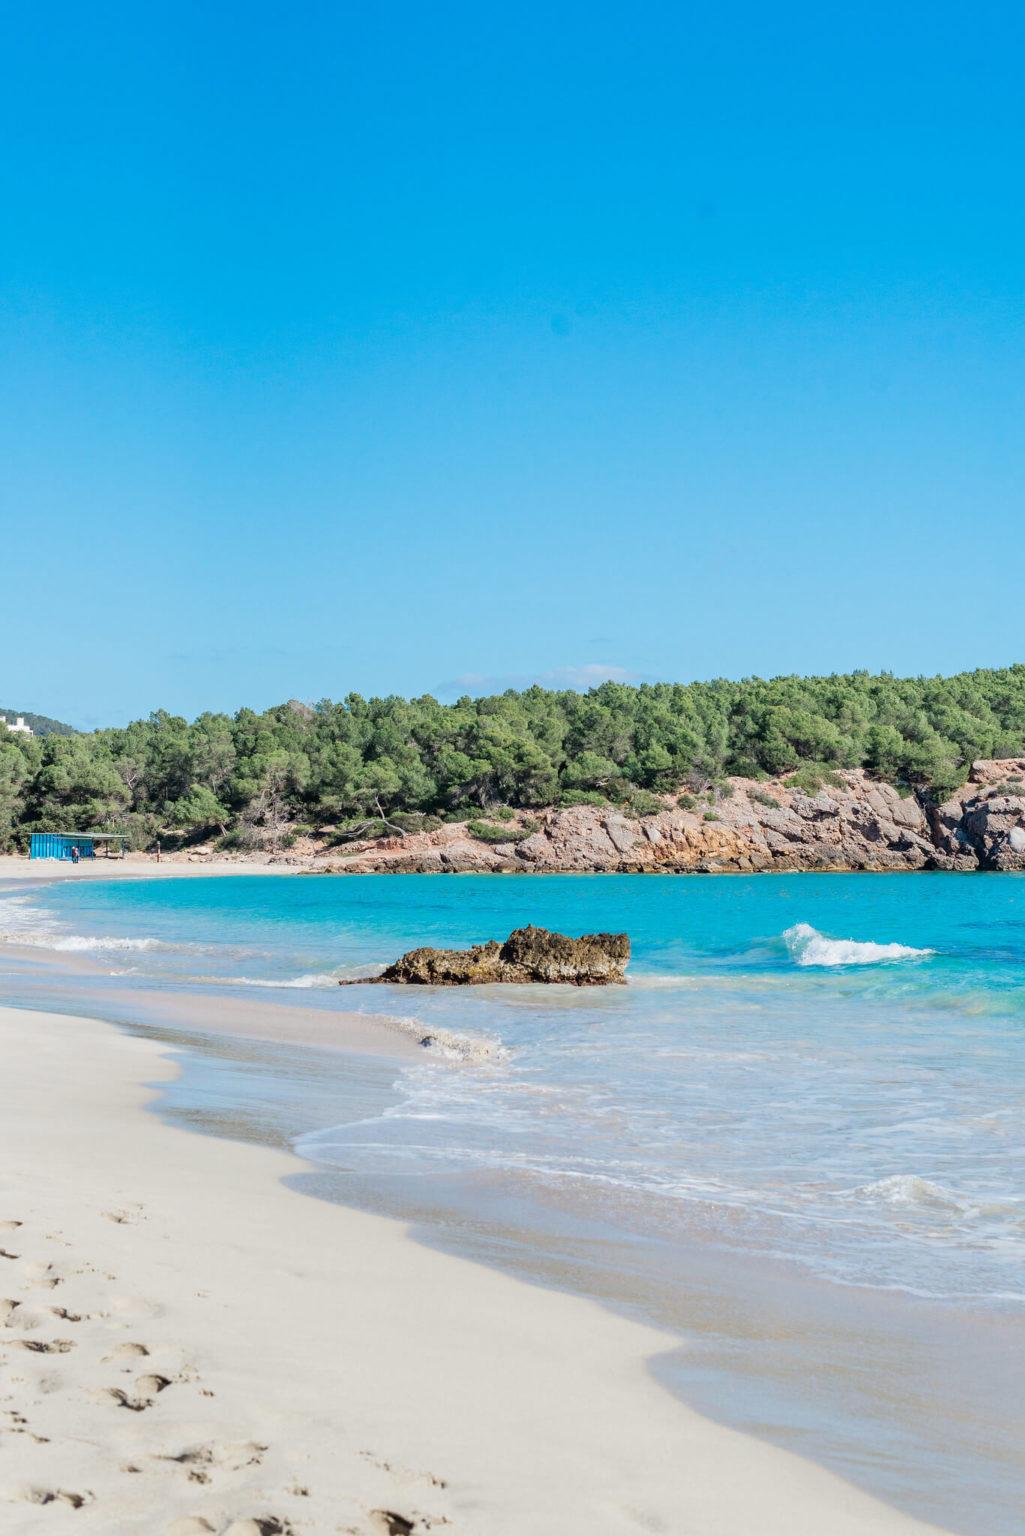 https://www.white-ibiza.com/wp-content/uploads/2020/03/ibiza-beaches-cala-nova-06-1025x1536.jpg